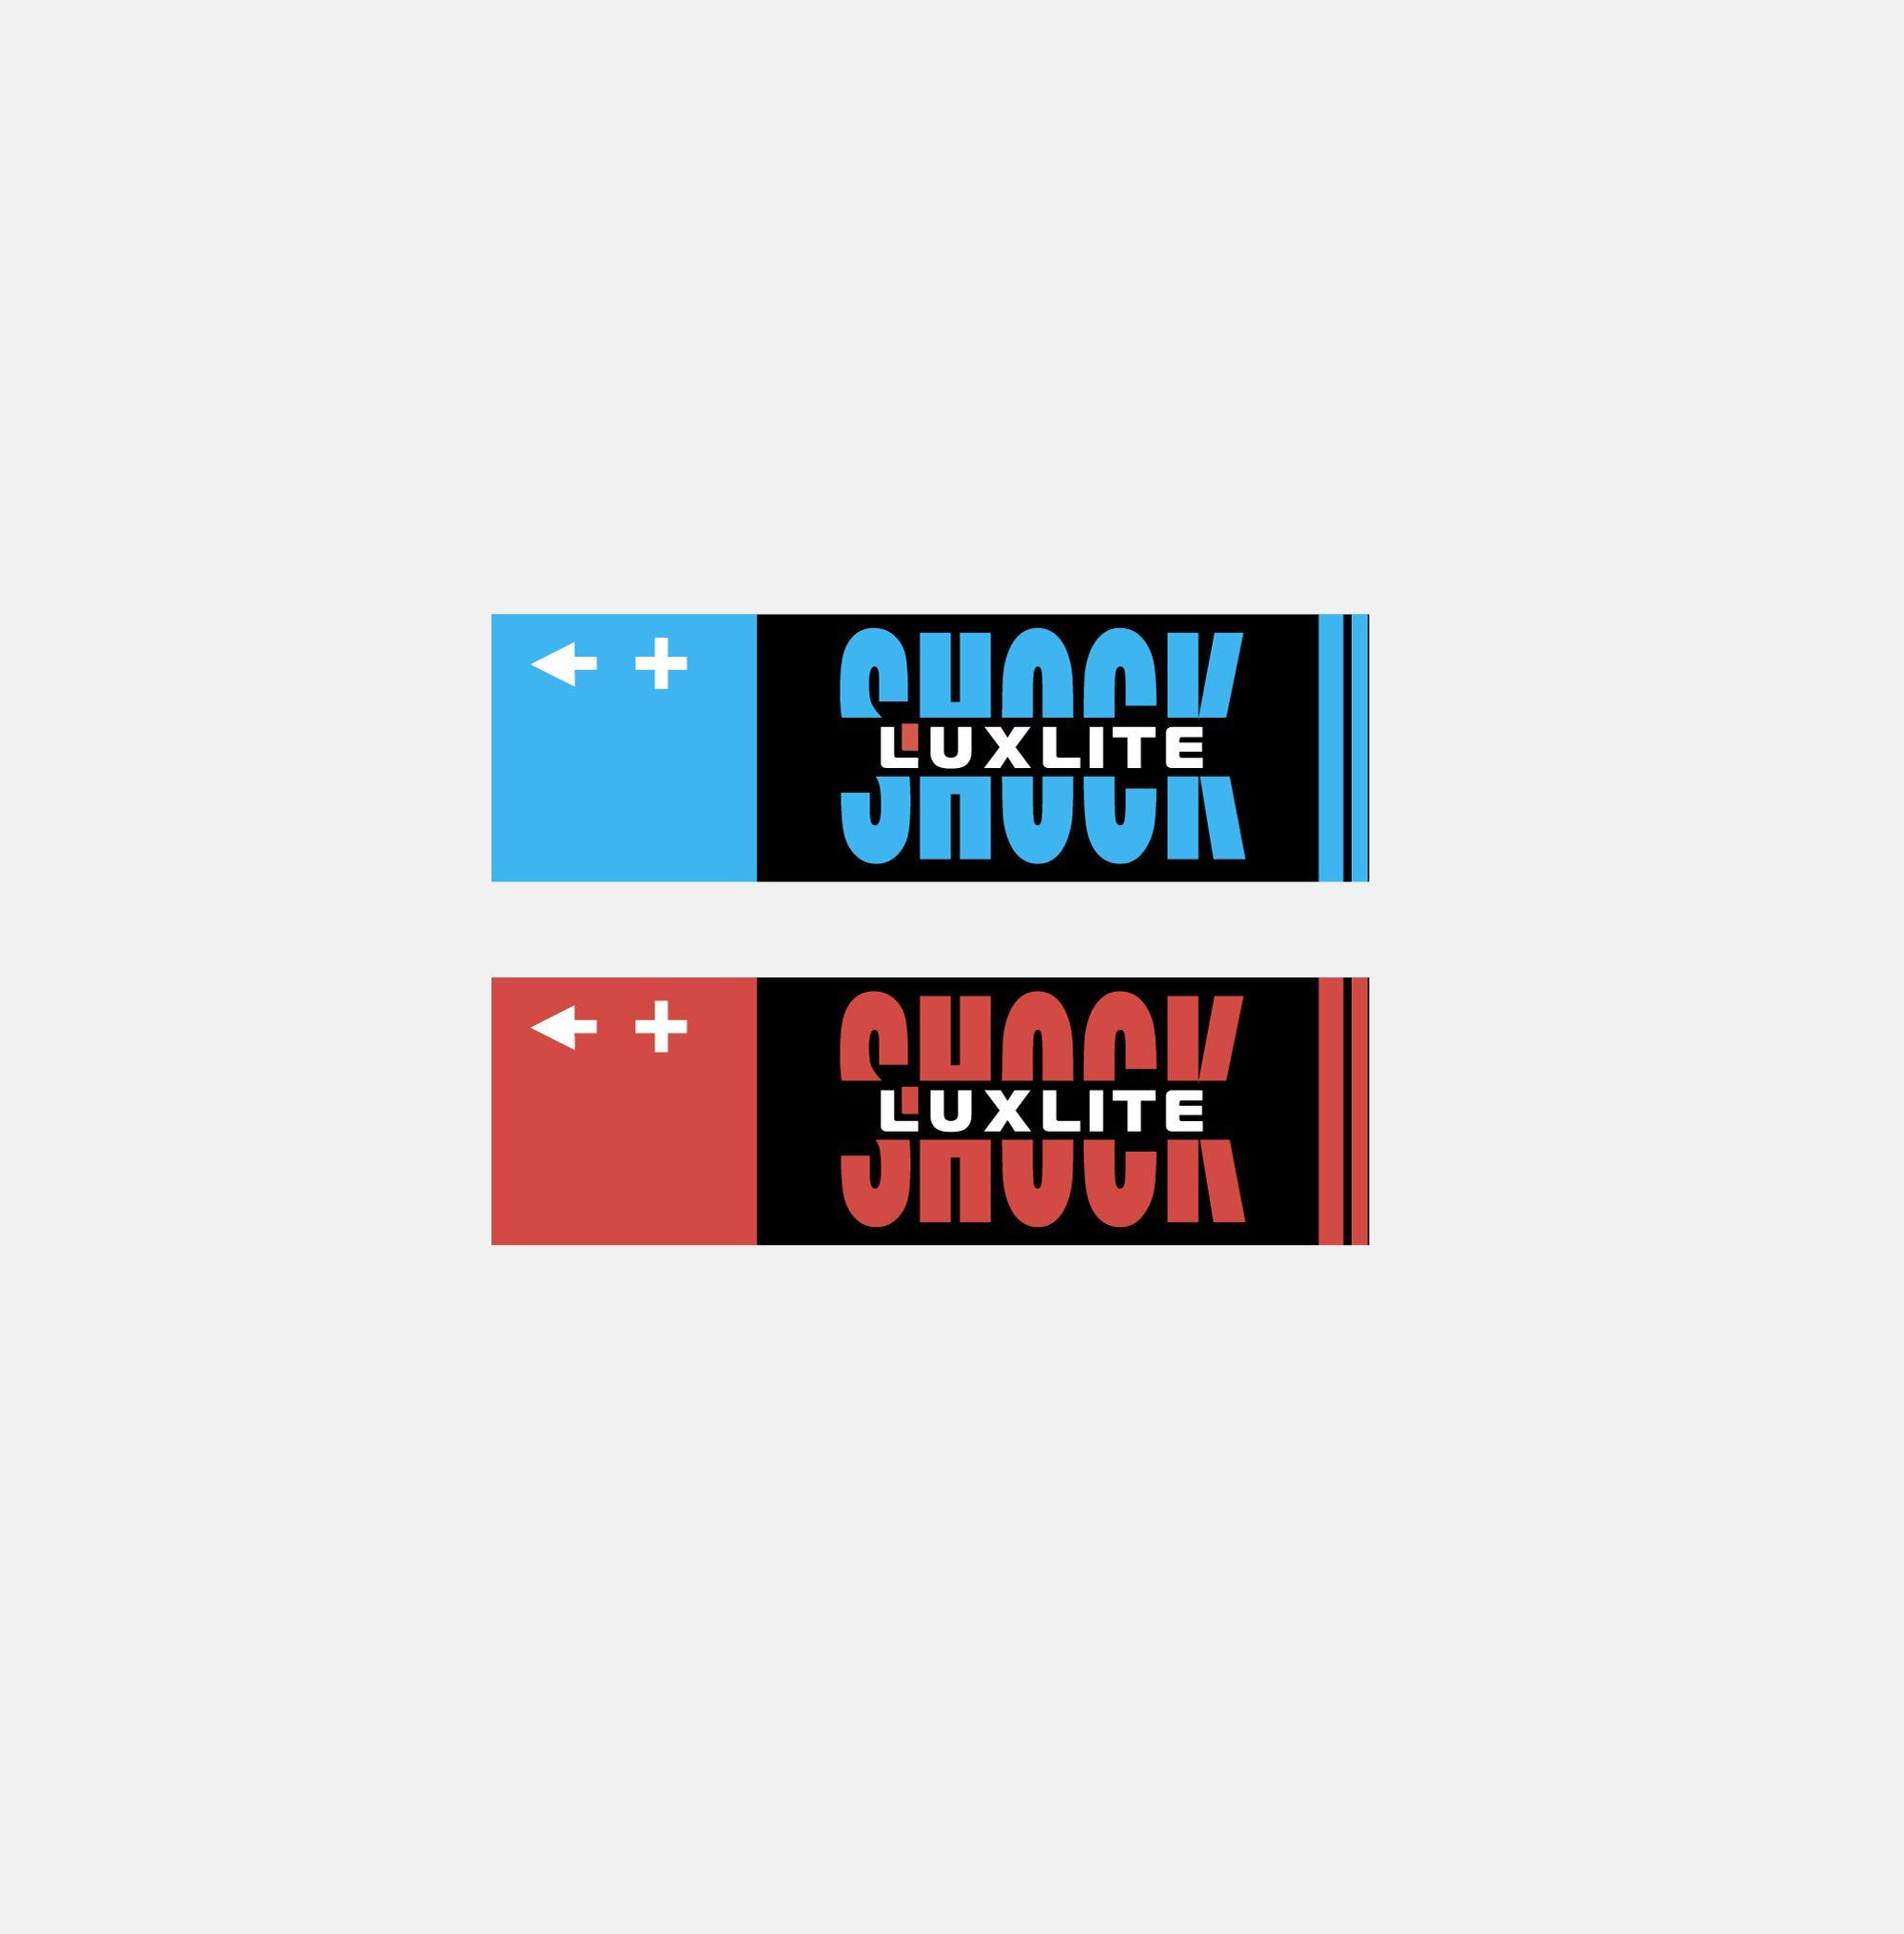 Логотип для батареек LUXLITE SHOCK - дизайнер Le_onik